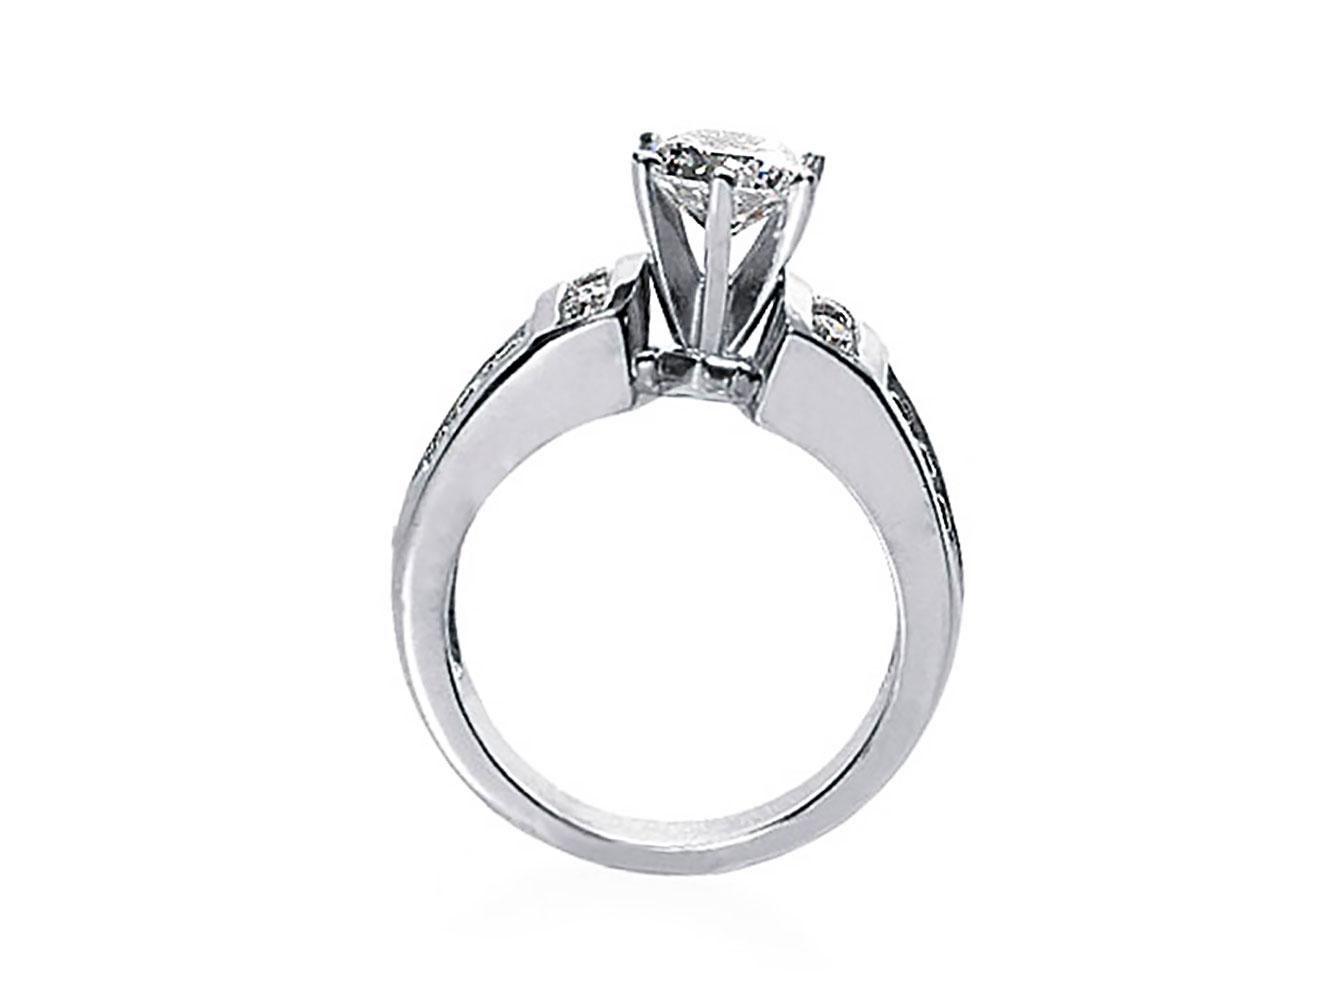 natural round diamond engagement ring solid 14k. Black Bedroom Furniture Sets. Home Design Ideas